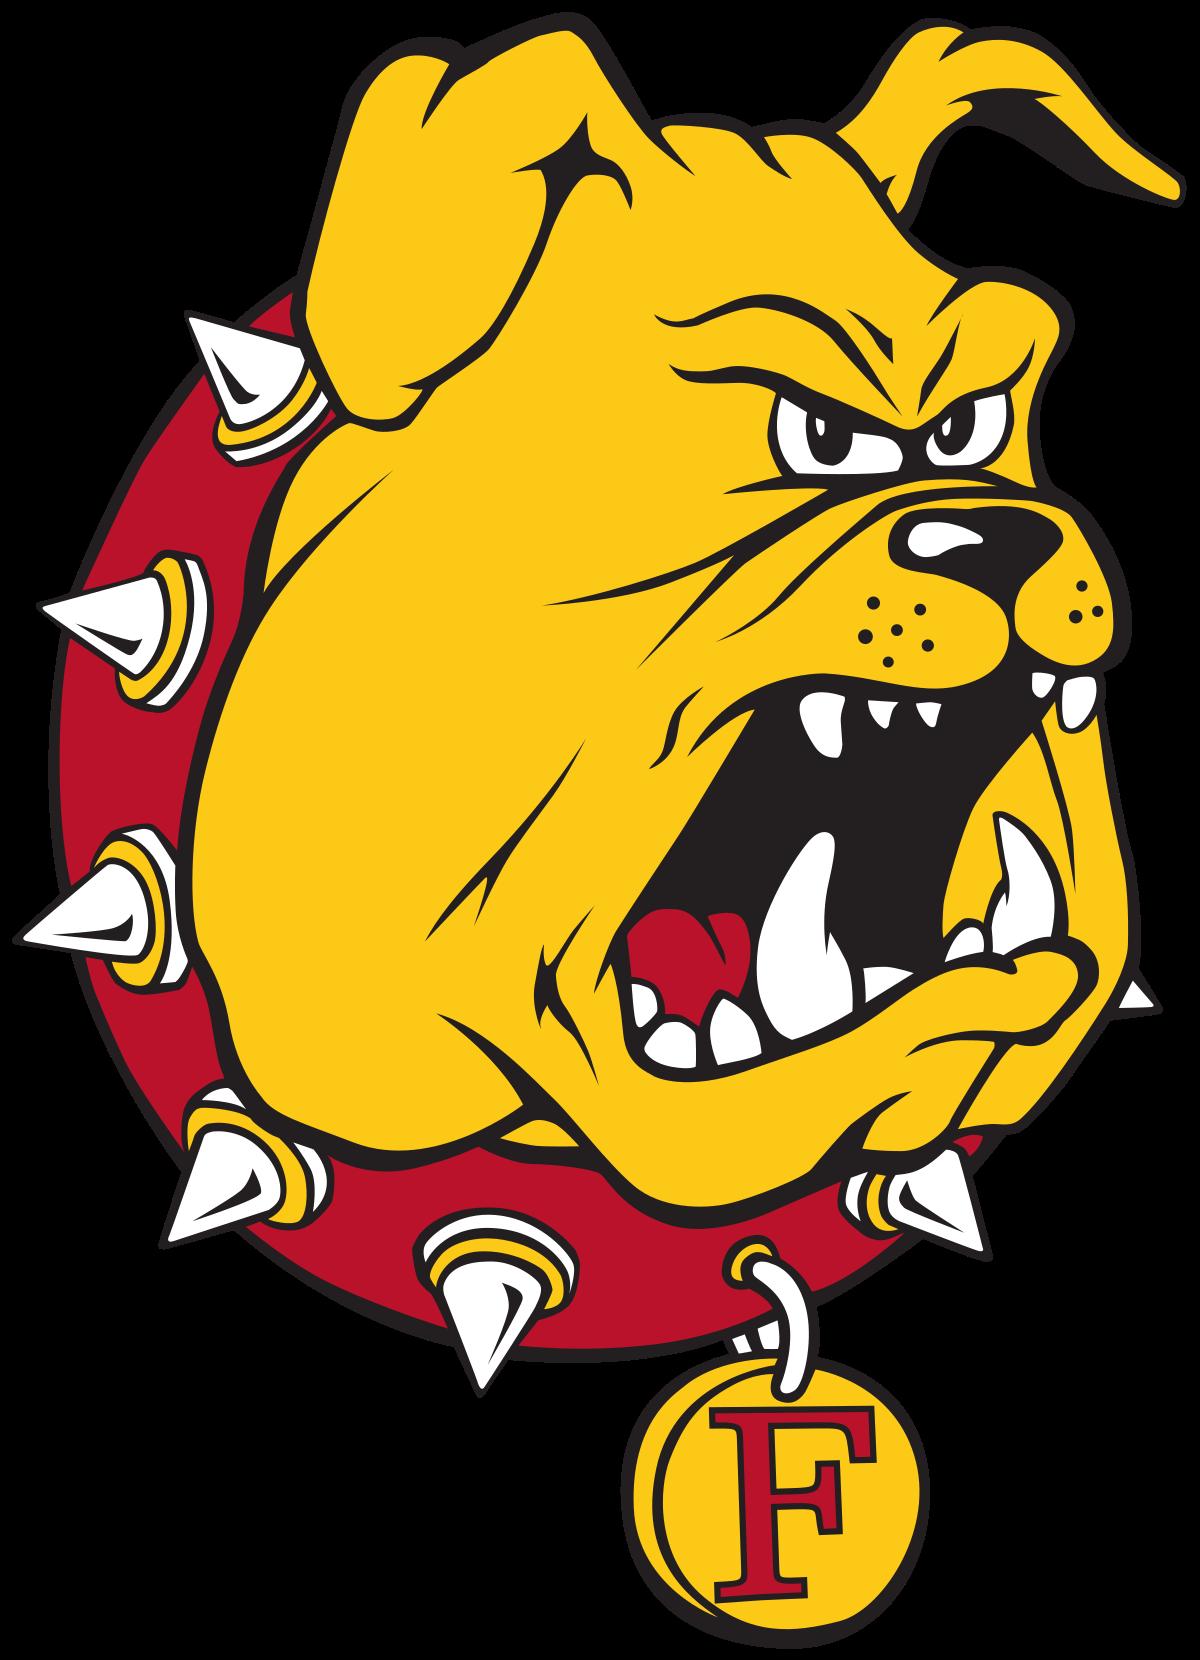 Ferris state bulldogs wikipedia. Wildcat clipart bearcat